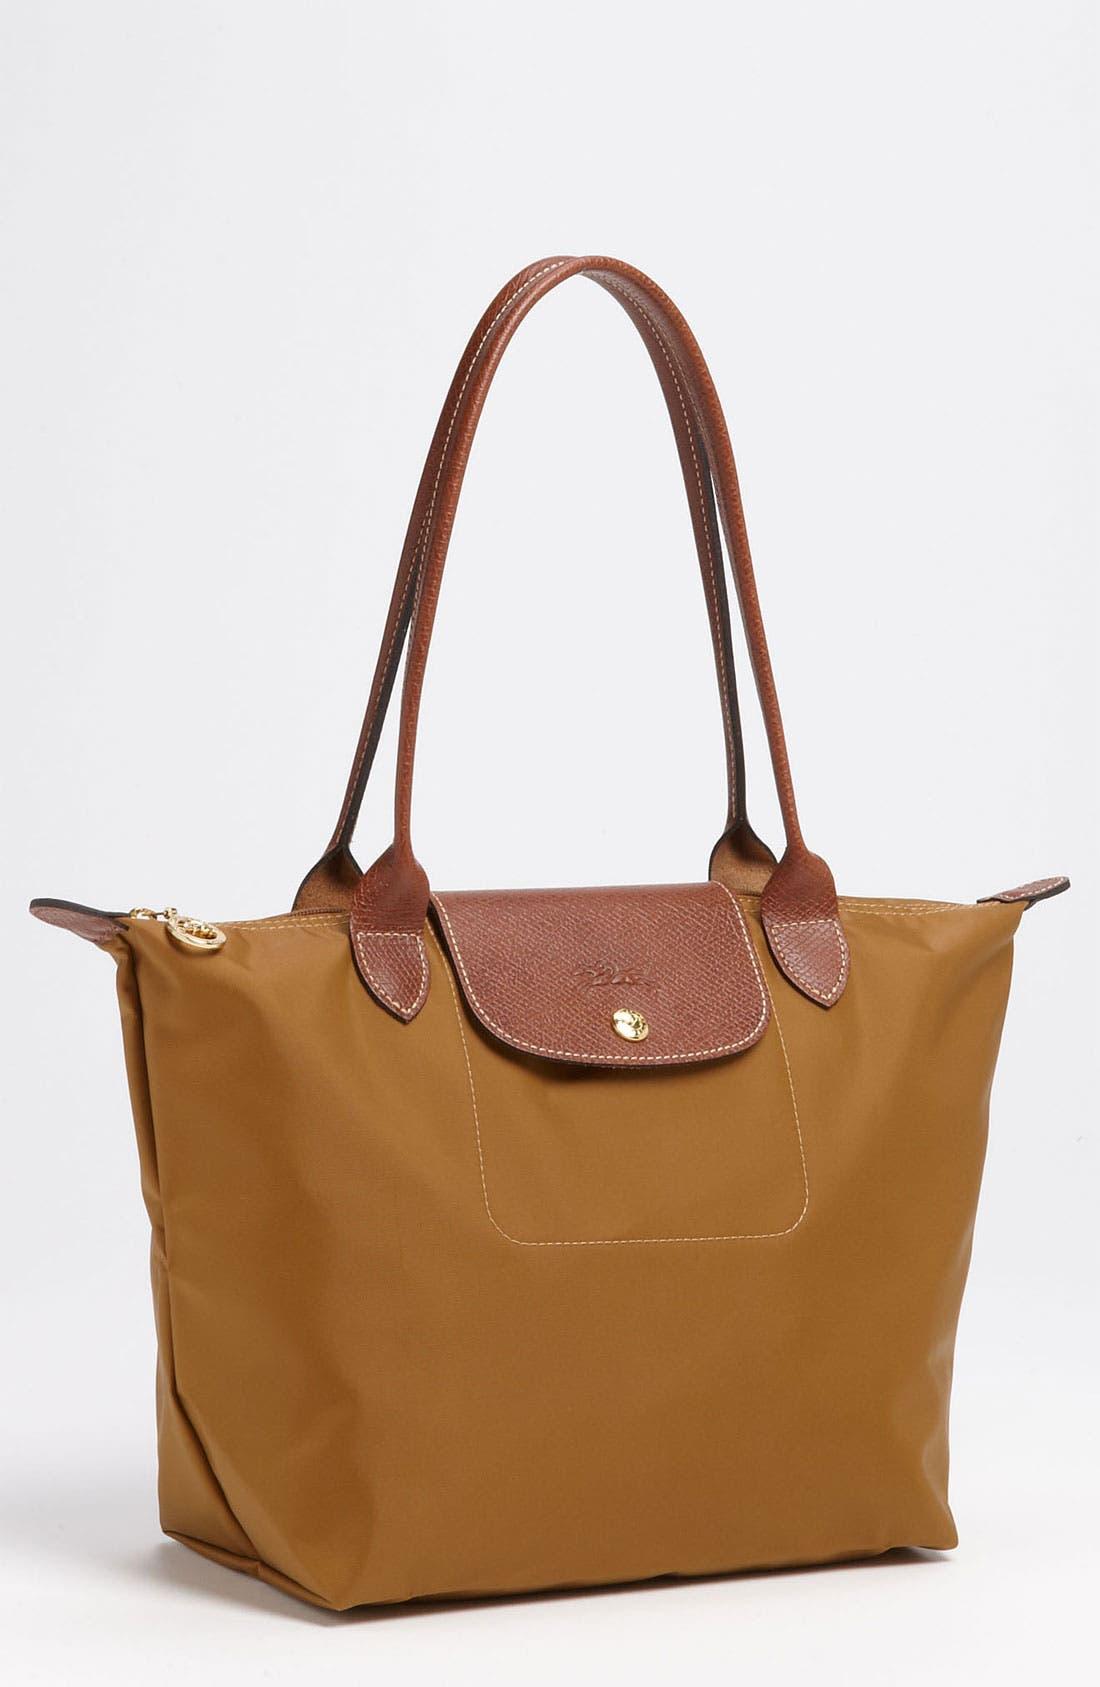 Alternate Image 1 Selected - Longchamp 'Le Pliage - Small Shopping Bag'